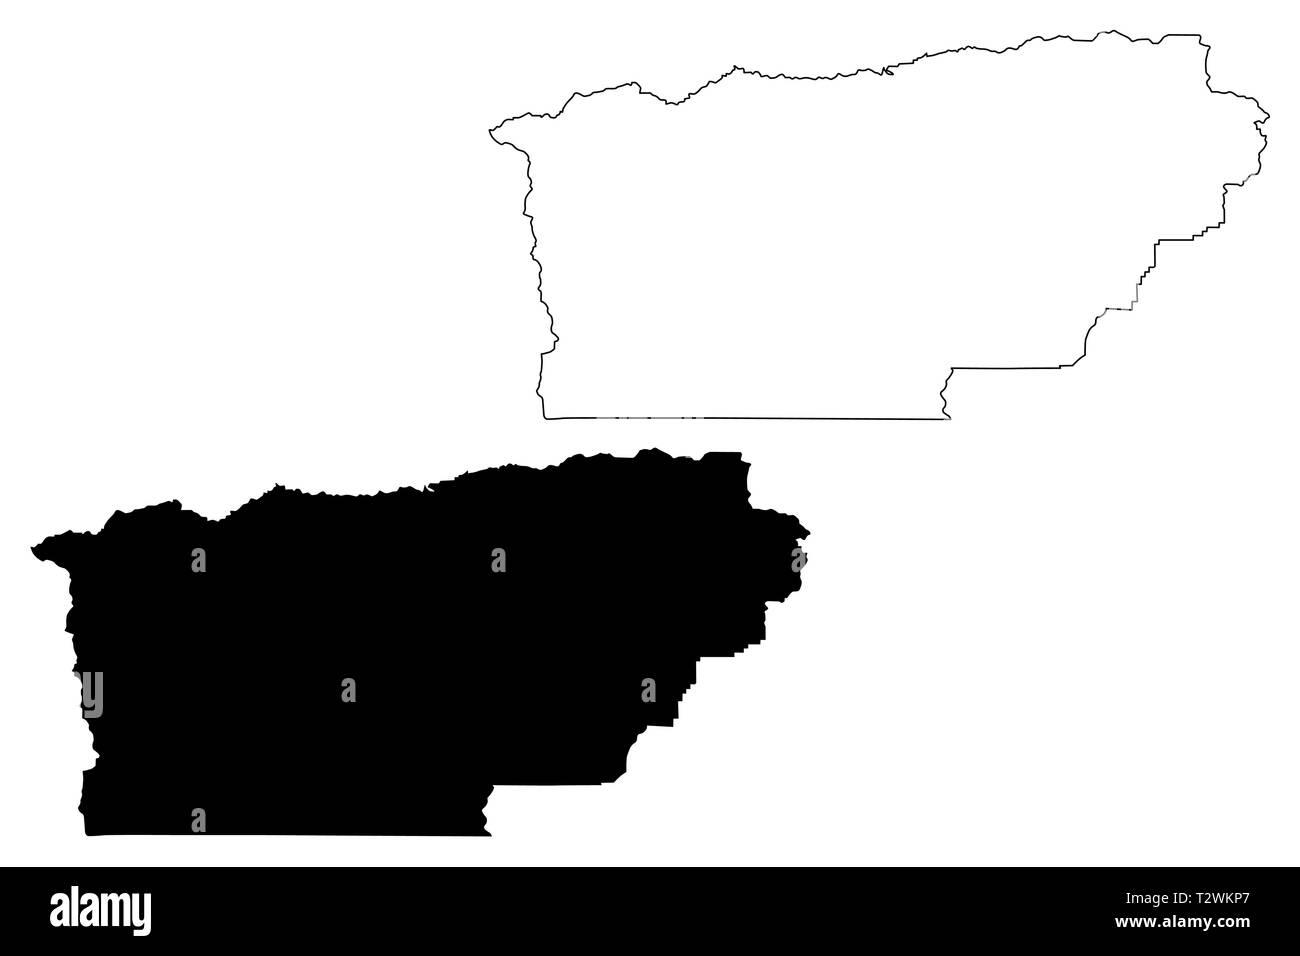 Tehama County, California (Counties in California, United ... on california native american reservations map, california local map, california earthquake map, california townships map, san bernardino mountains california map, california areas map, california states map, san diego map, hayward california city map, california cities, california places map, northern california map, california streams map, california population density map, southern california map, san francisco bay area transit map, central valley california map, south california map, california co map, 1862 california flood map,